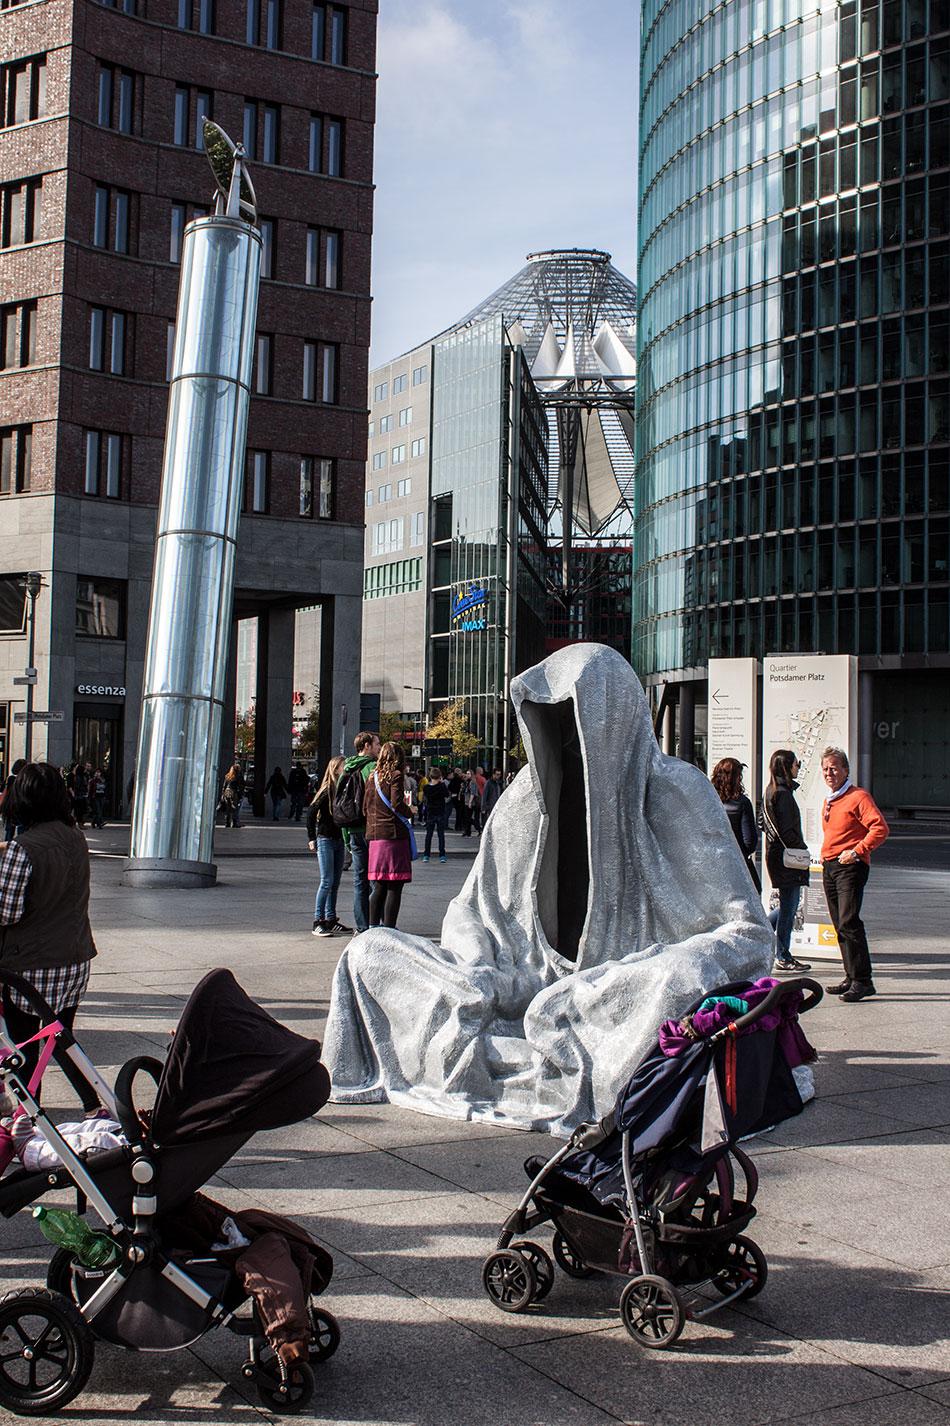 festival-of-lights-berlin-potzdamer-platz-light-art-show-exhibition-lumina-guardians-of-time-manfred-kili-kielnhofer-contemporary-arts-design-sculpture-3094